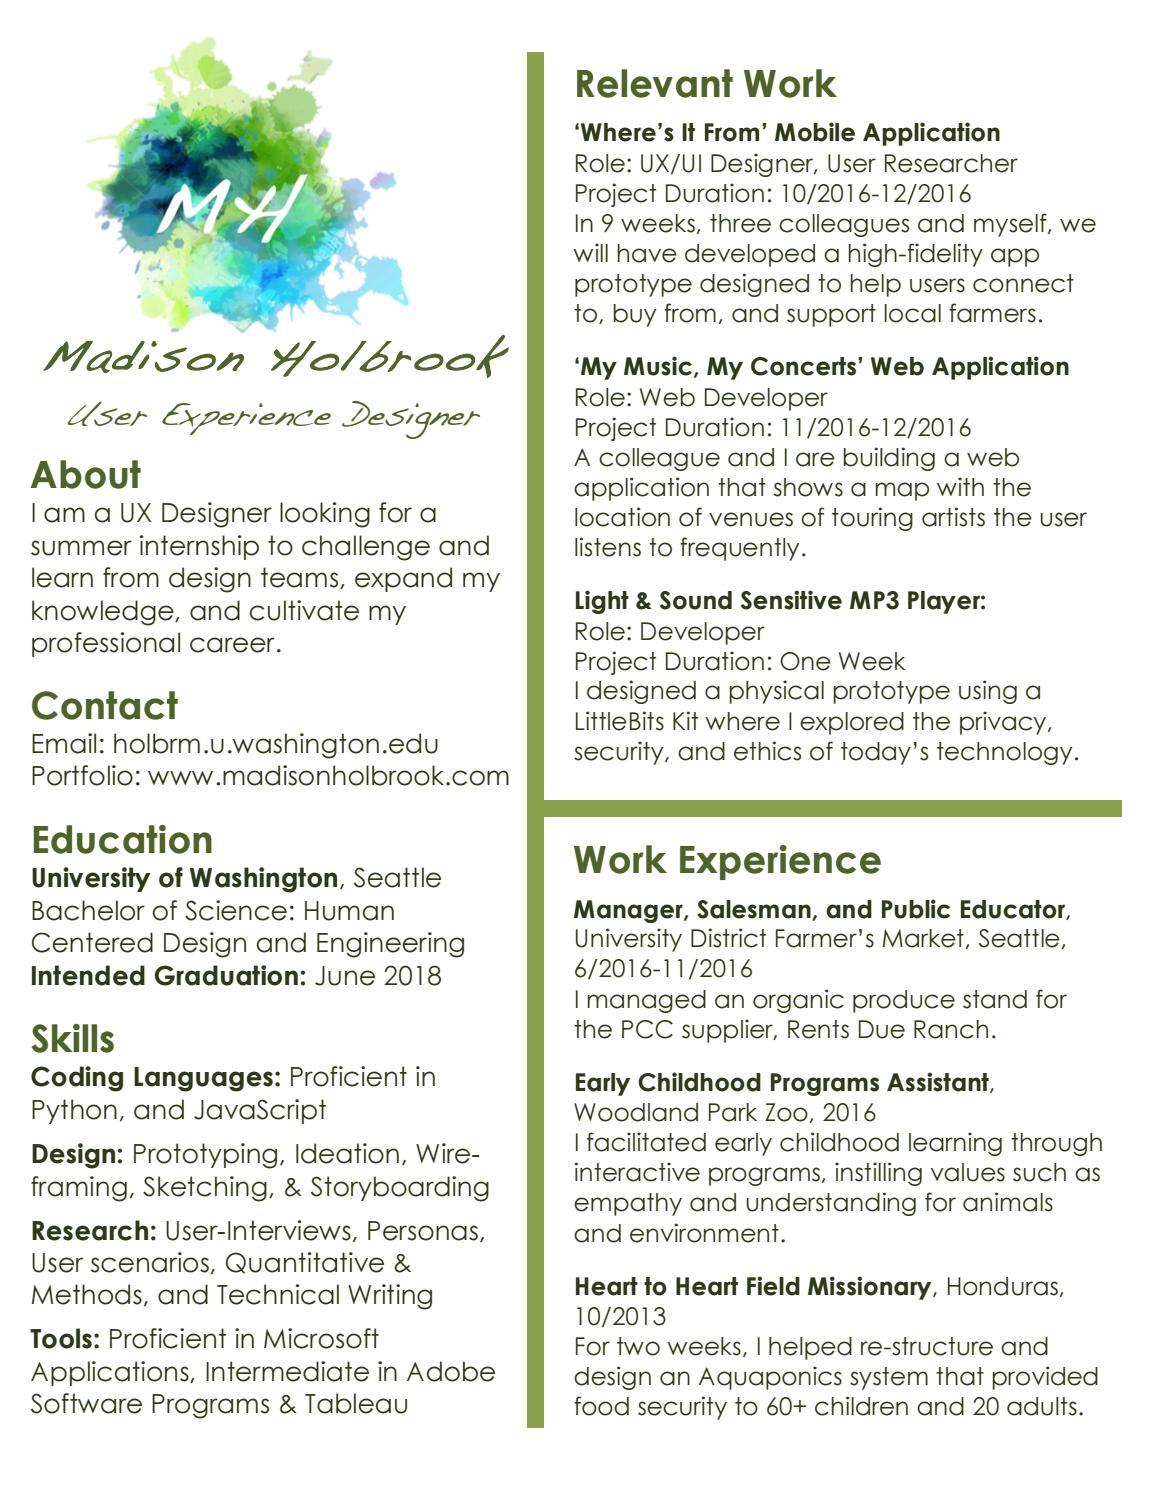 User Centered Design Resume by Madison Holbrook - issuu